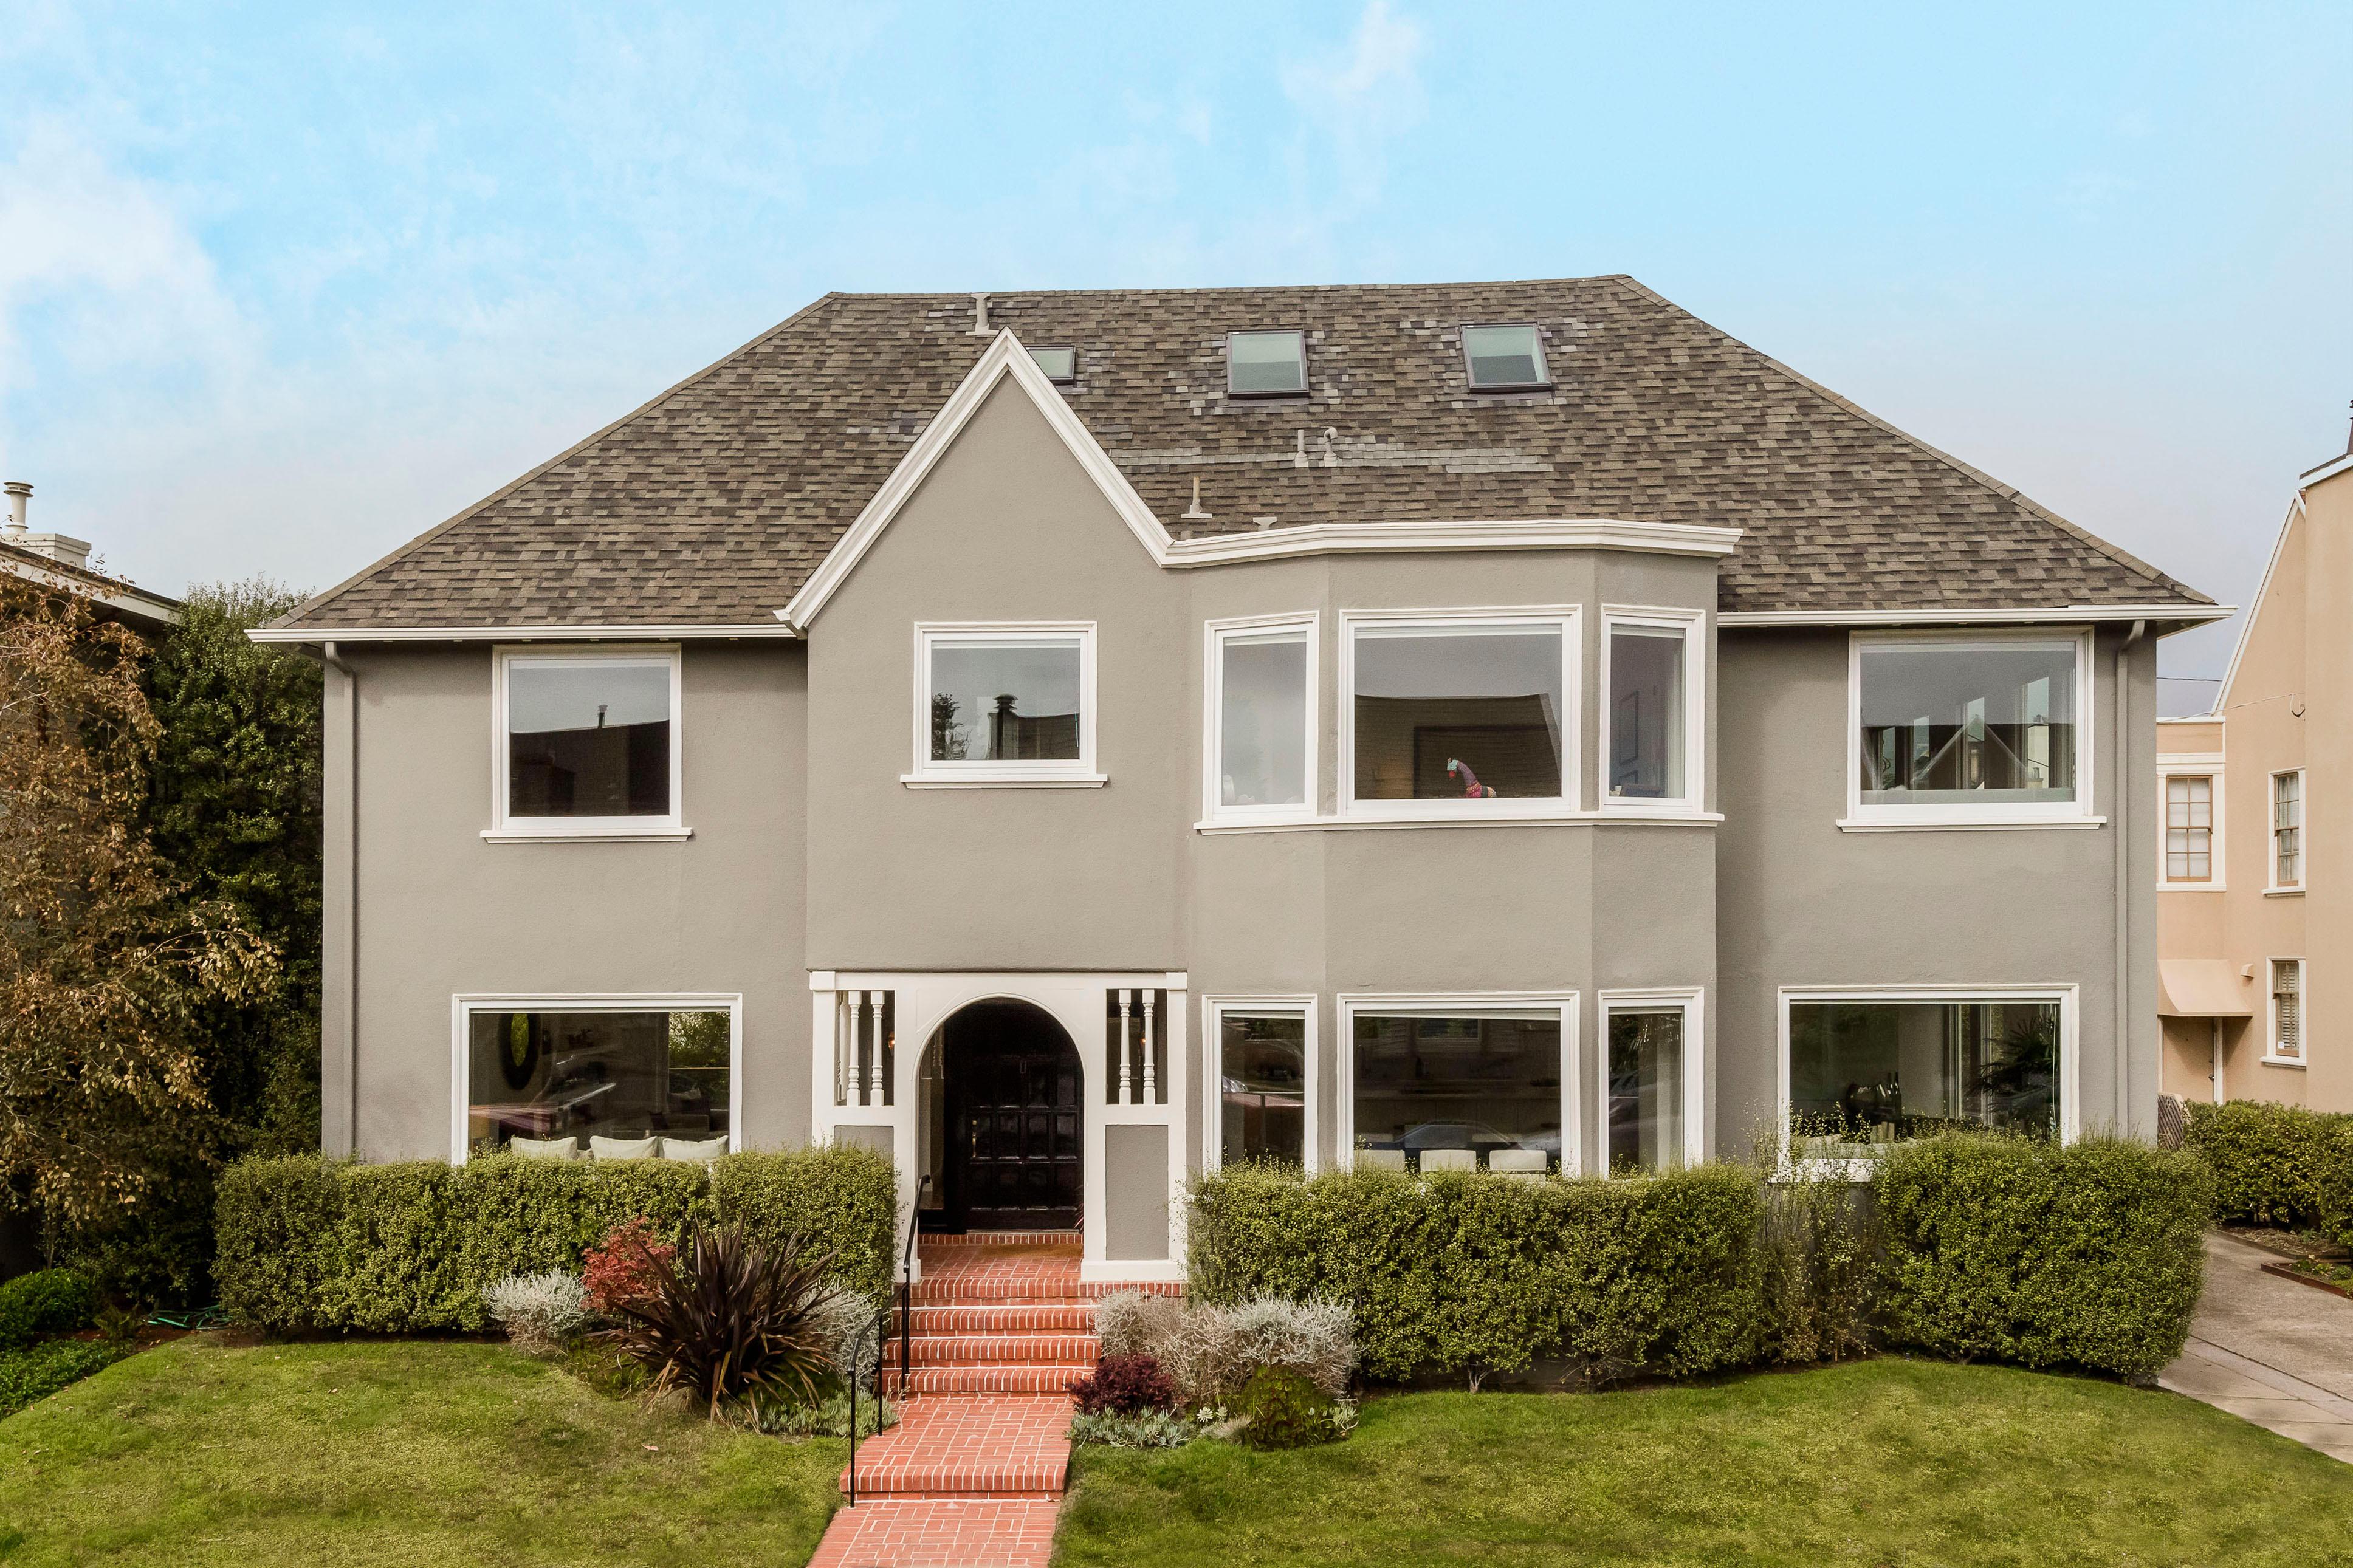 Robert R. Callan Jr. - McGuire Real Estate image 7